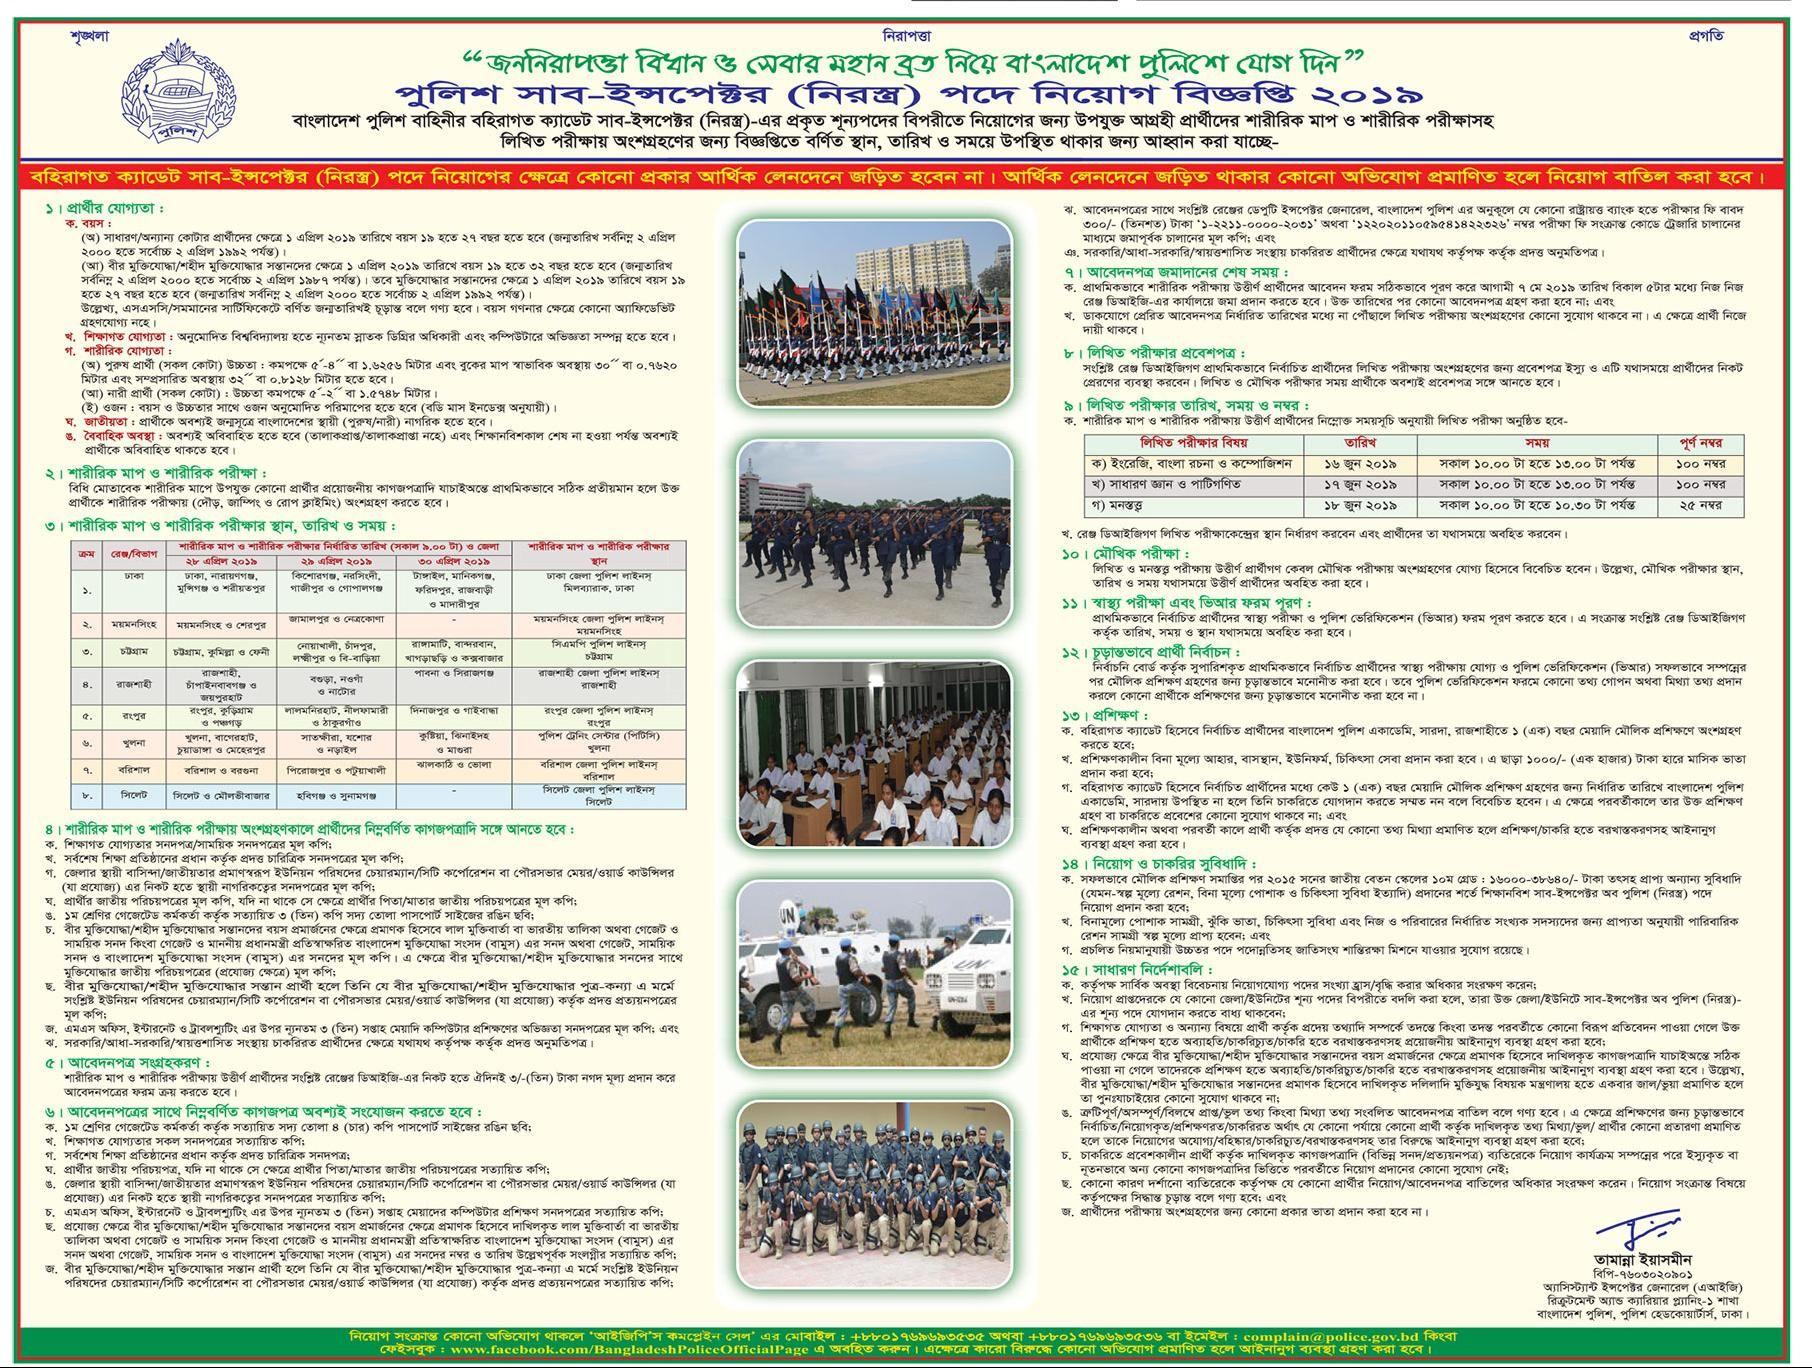 Bangladesh Police Job Circular 2019 - Lekhapora BD Jobs | 111111